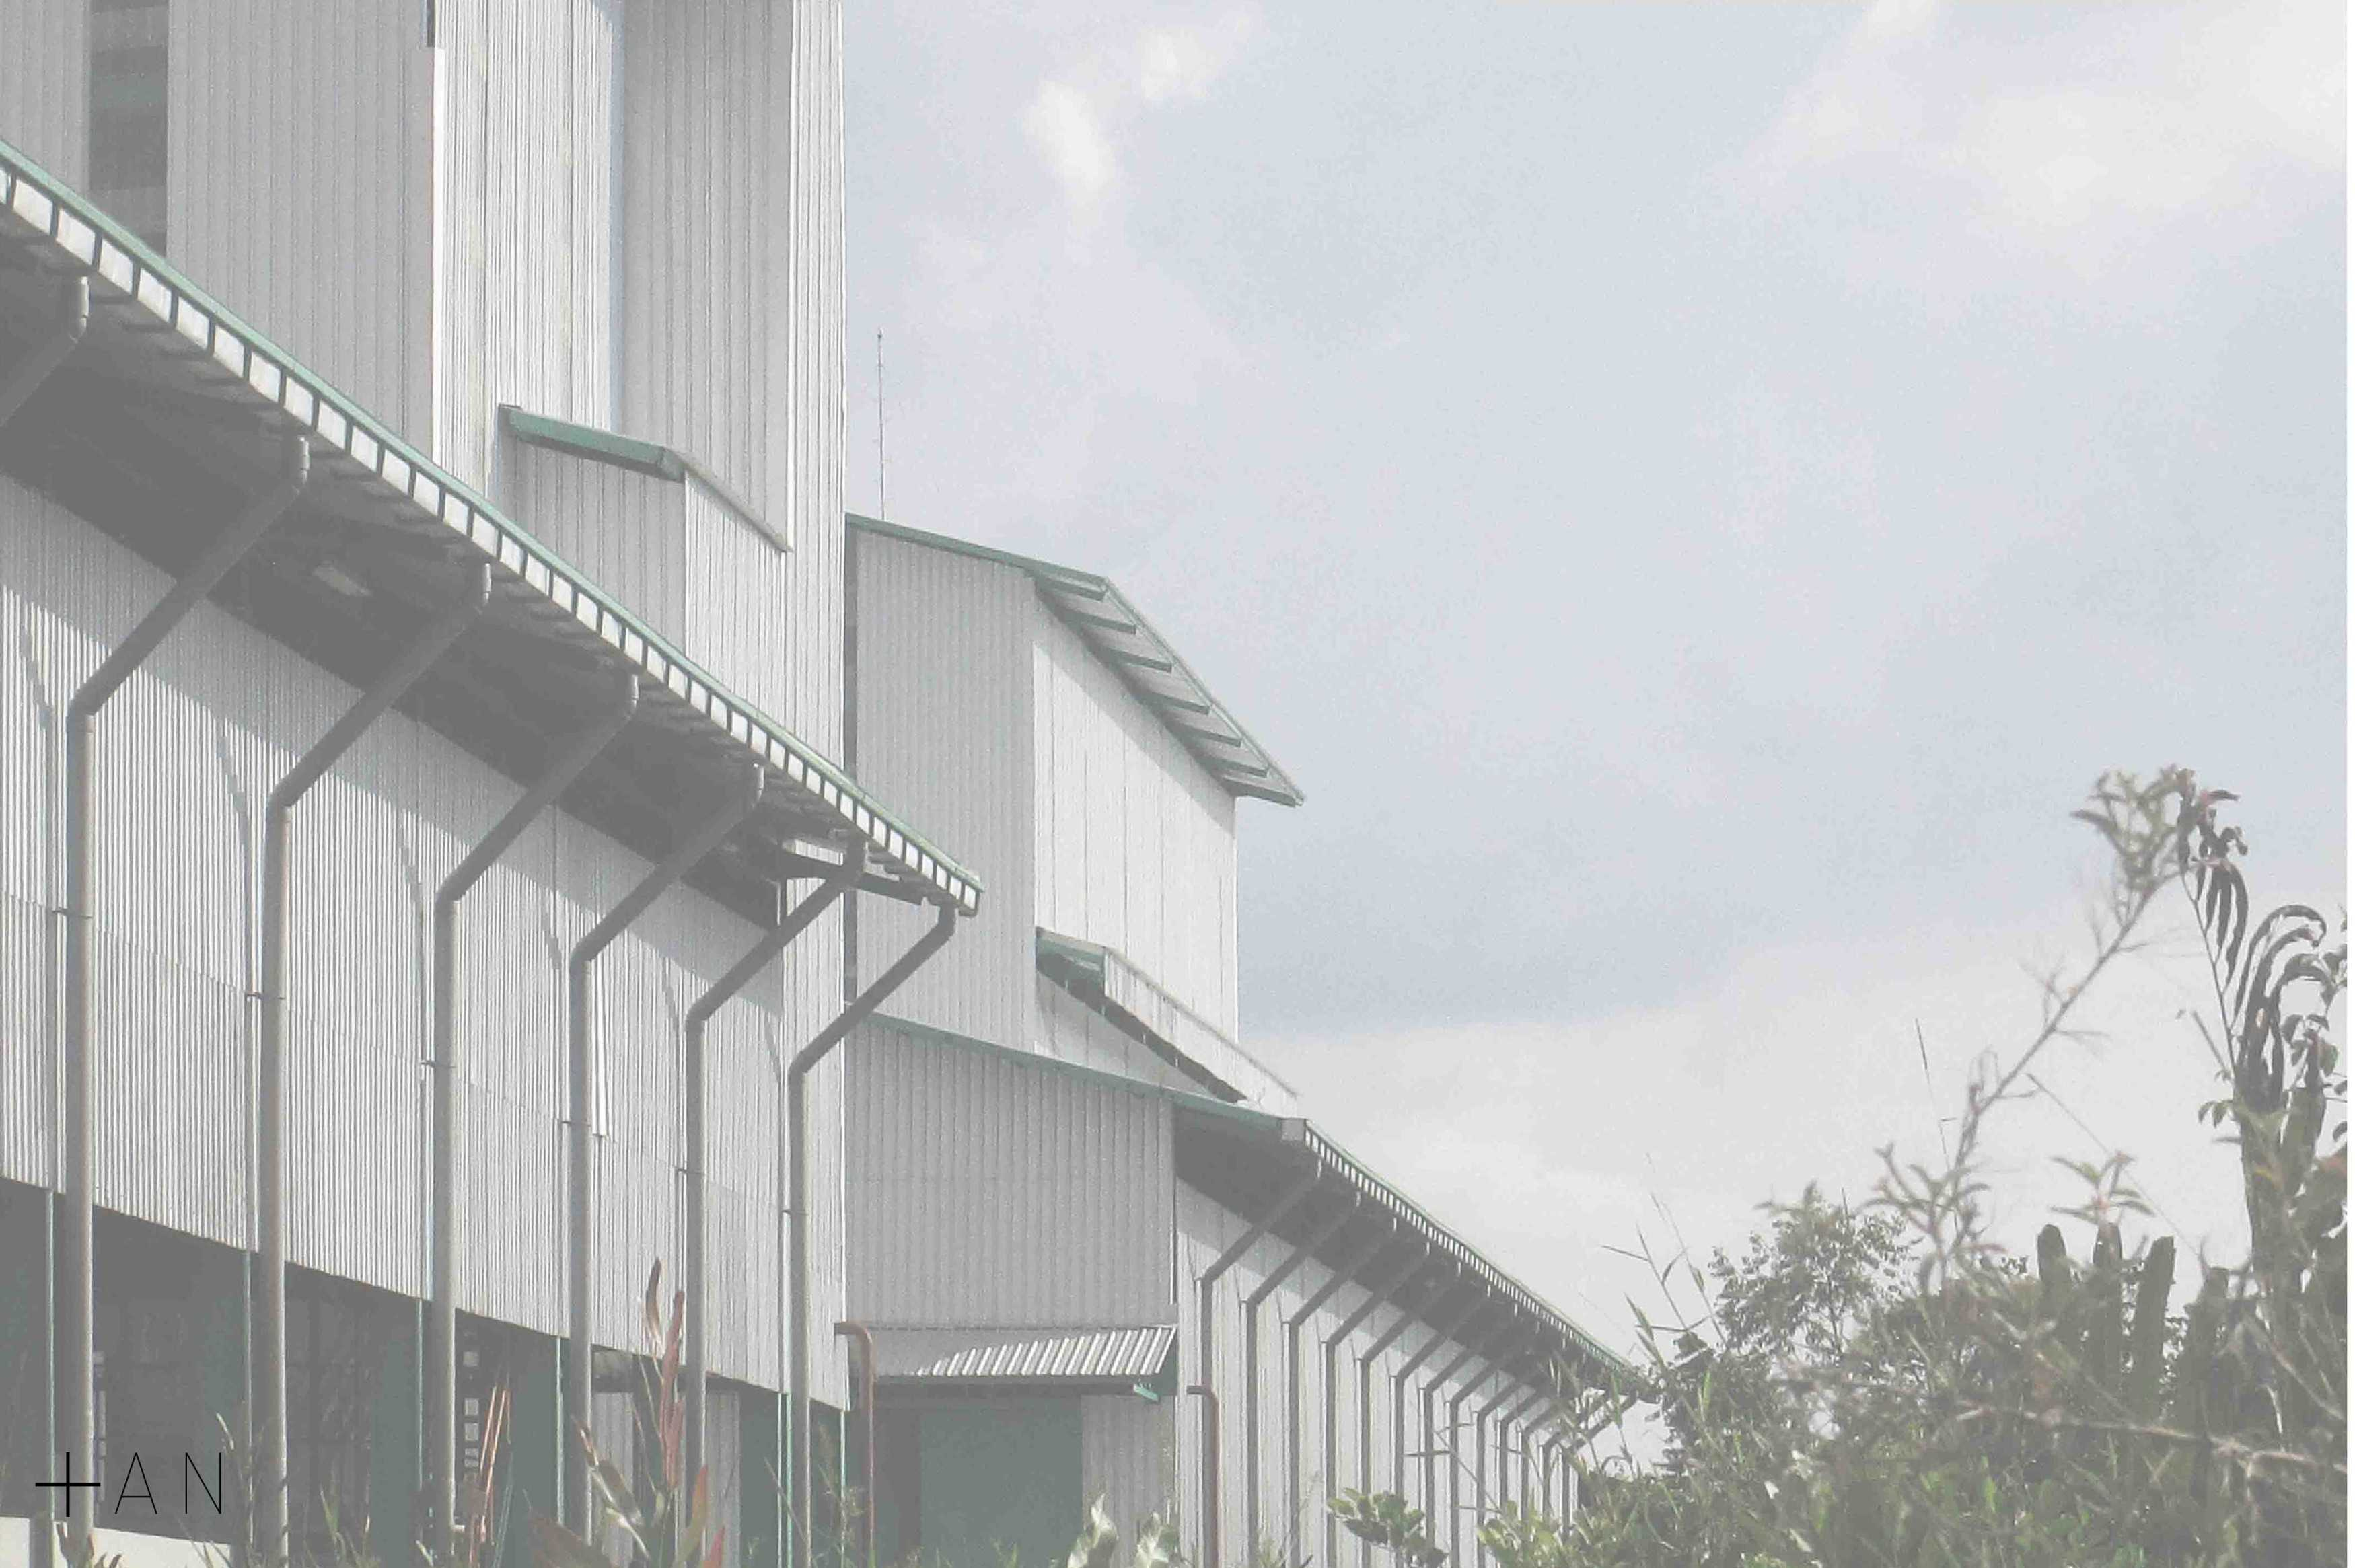 Tan Building Workshop Wp Factory  Pontianak, West Kalimantan, Indonesia Pontianak, West Kalimantan, Indonesia Exterior Wp Factory Modern  26715